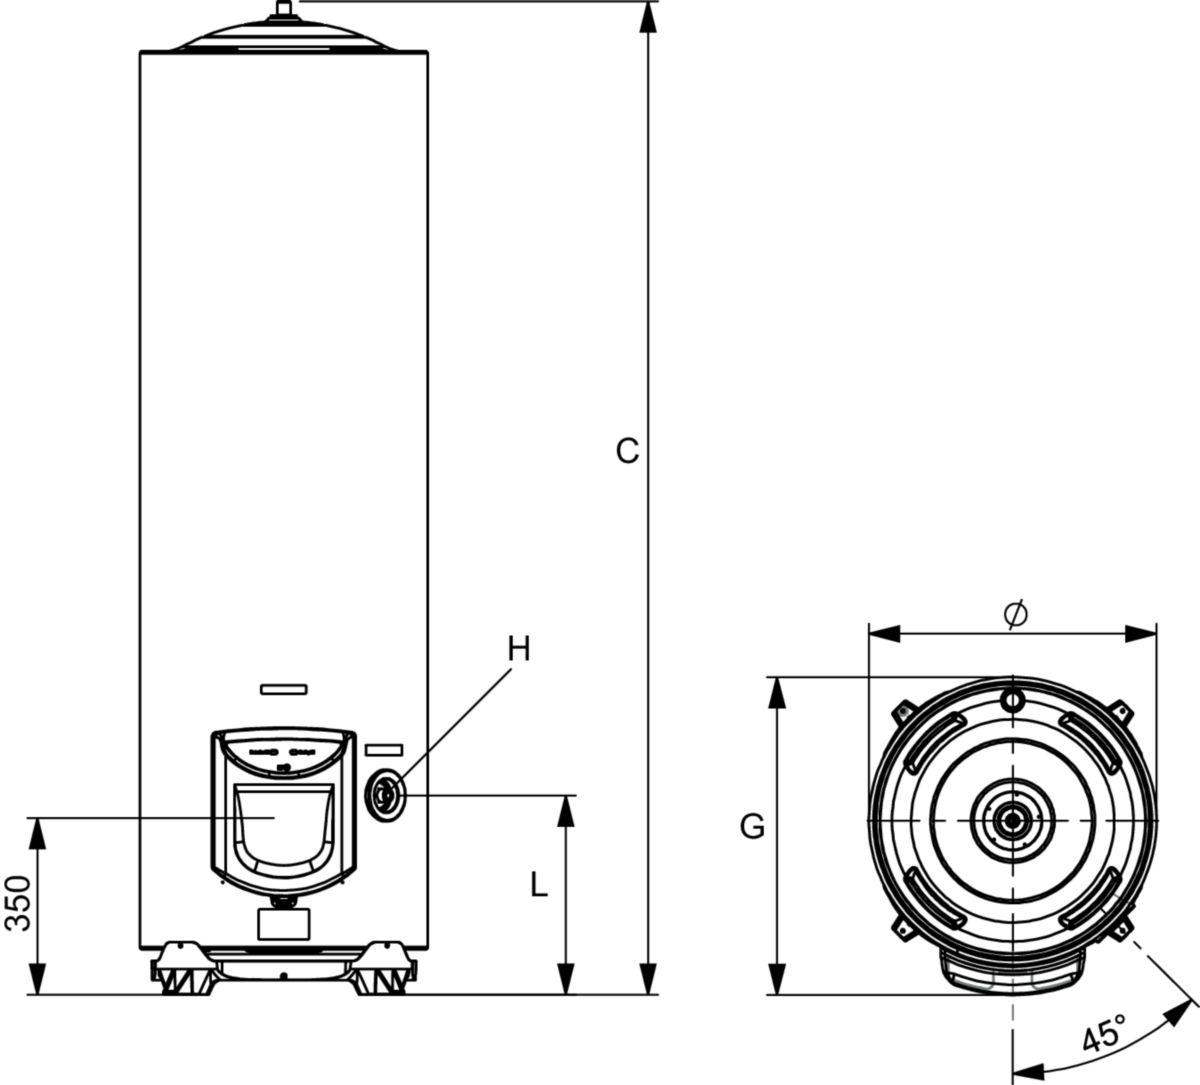 Ariston Thermo Chauffe Eau Electrique Vertical Mural Steatite 100 Litres Diametre 505mm Classe Energetique C Ref 3000450 Plomberie Bricolage